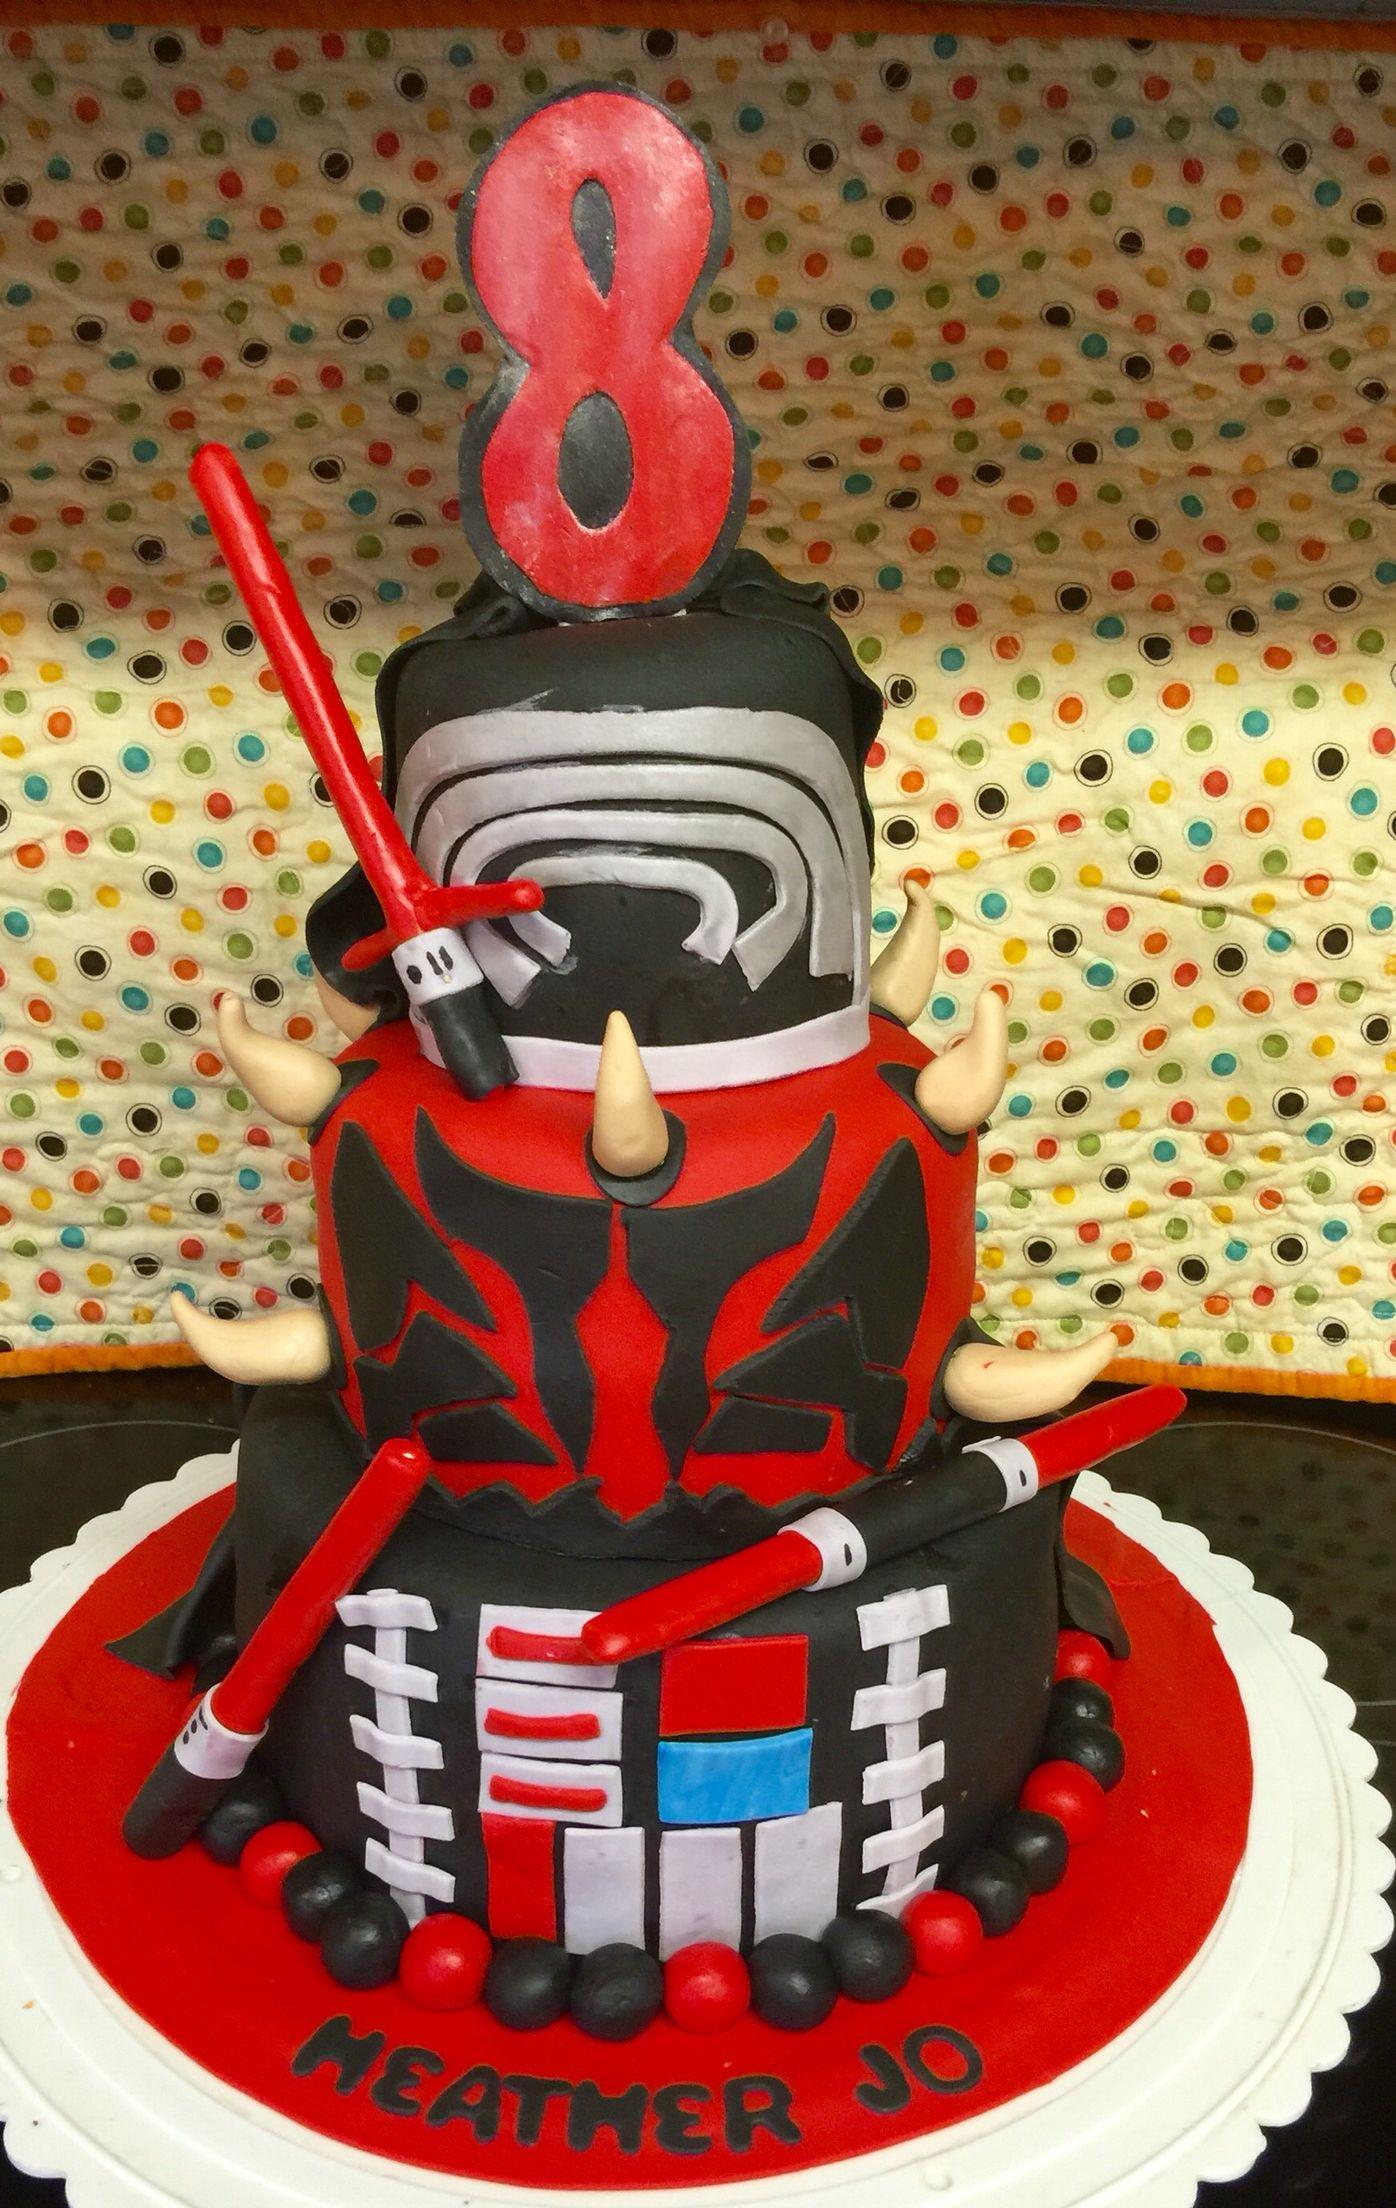 Star Wars Cake Dark Side Darth Vader Darth Maul And Kylo Ren